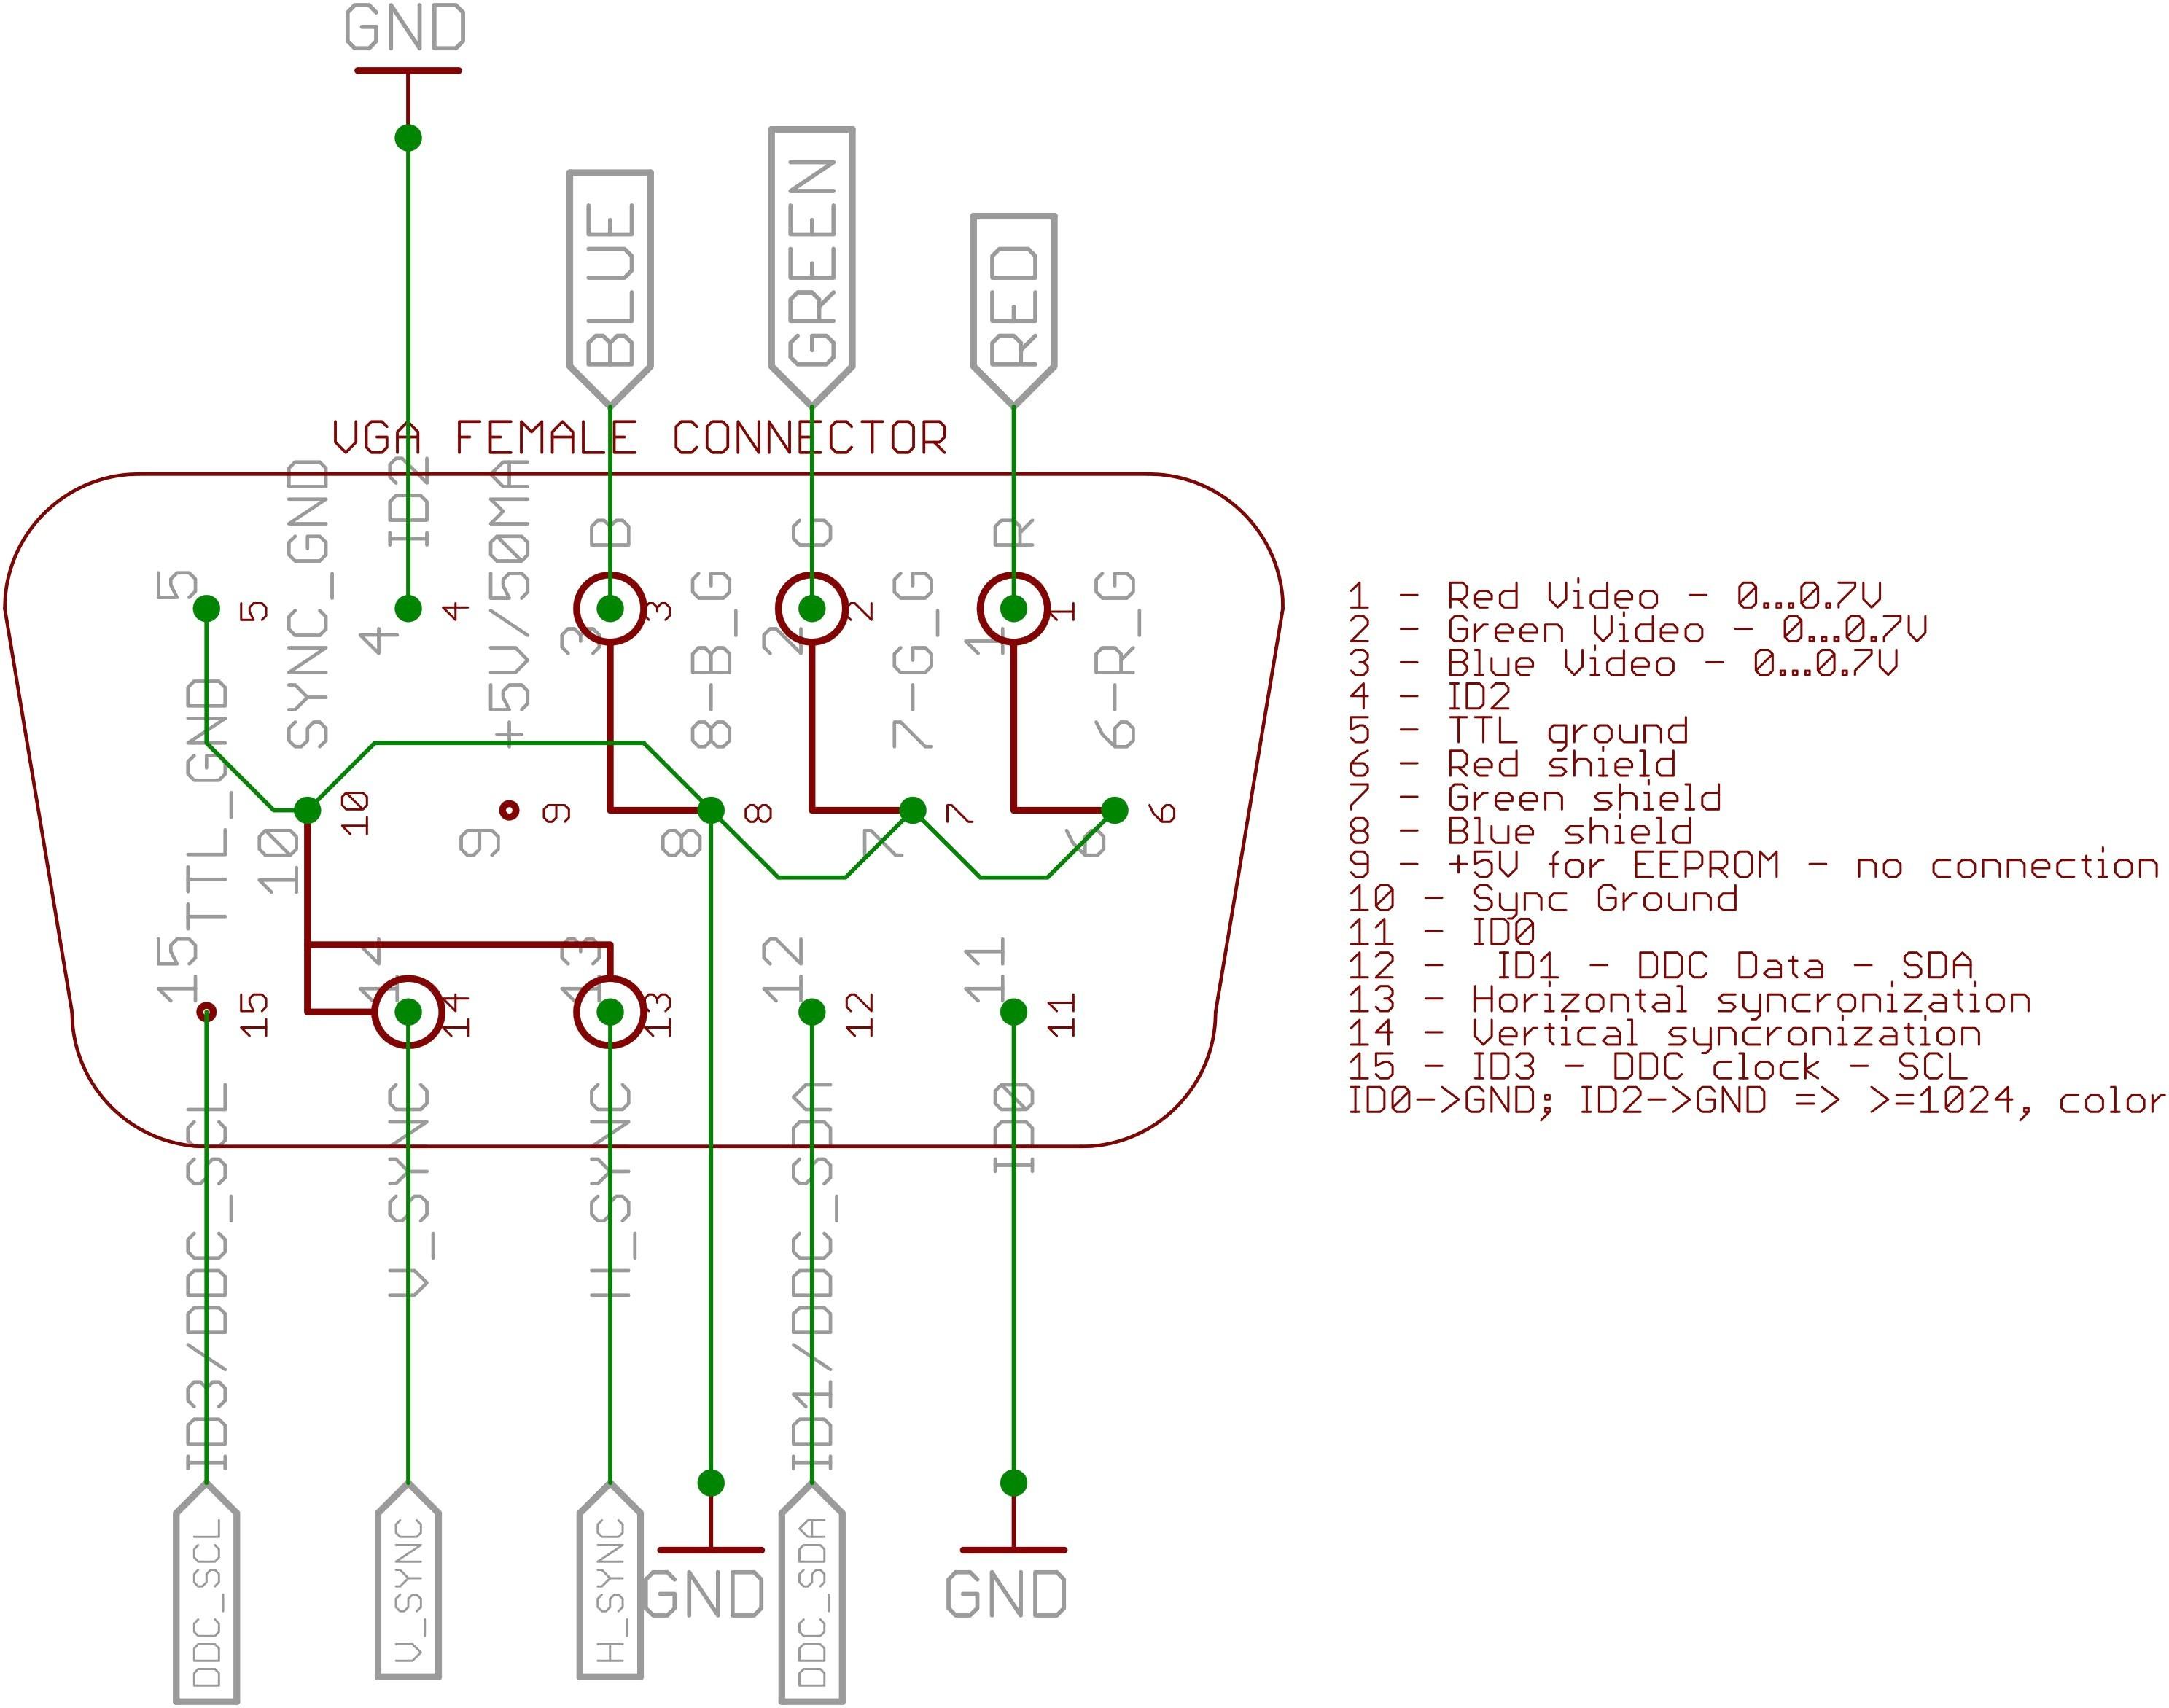 wiring schamitic vga to rca pinout diagram wiring diagrams secondschematic vga to rca wiring diagrams konsult